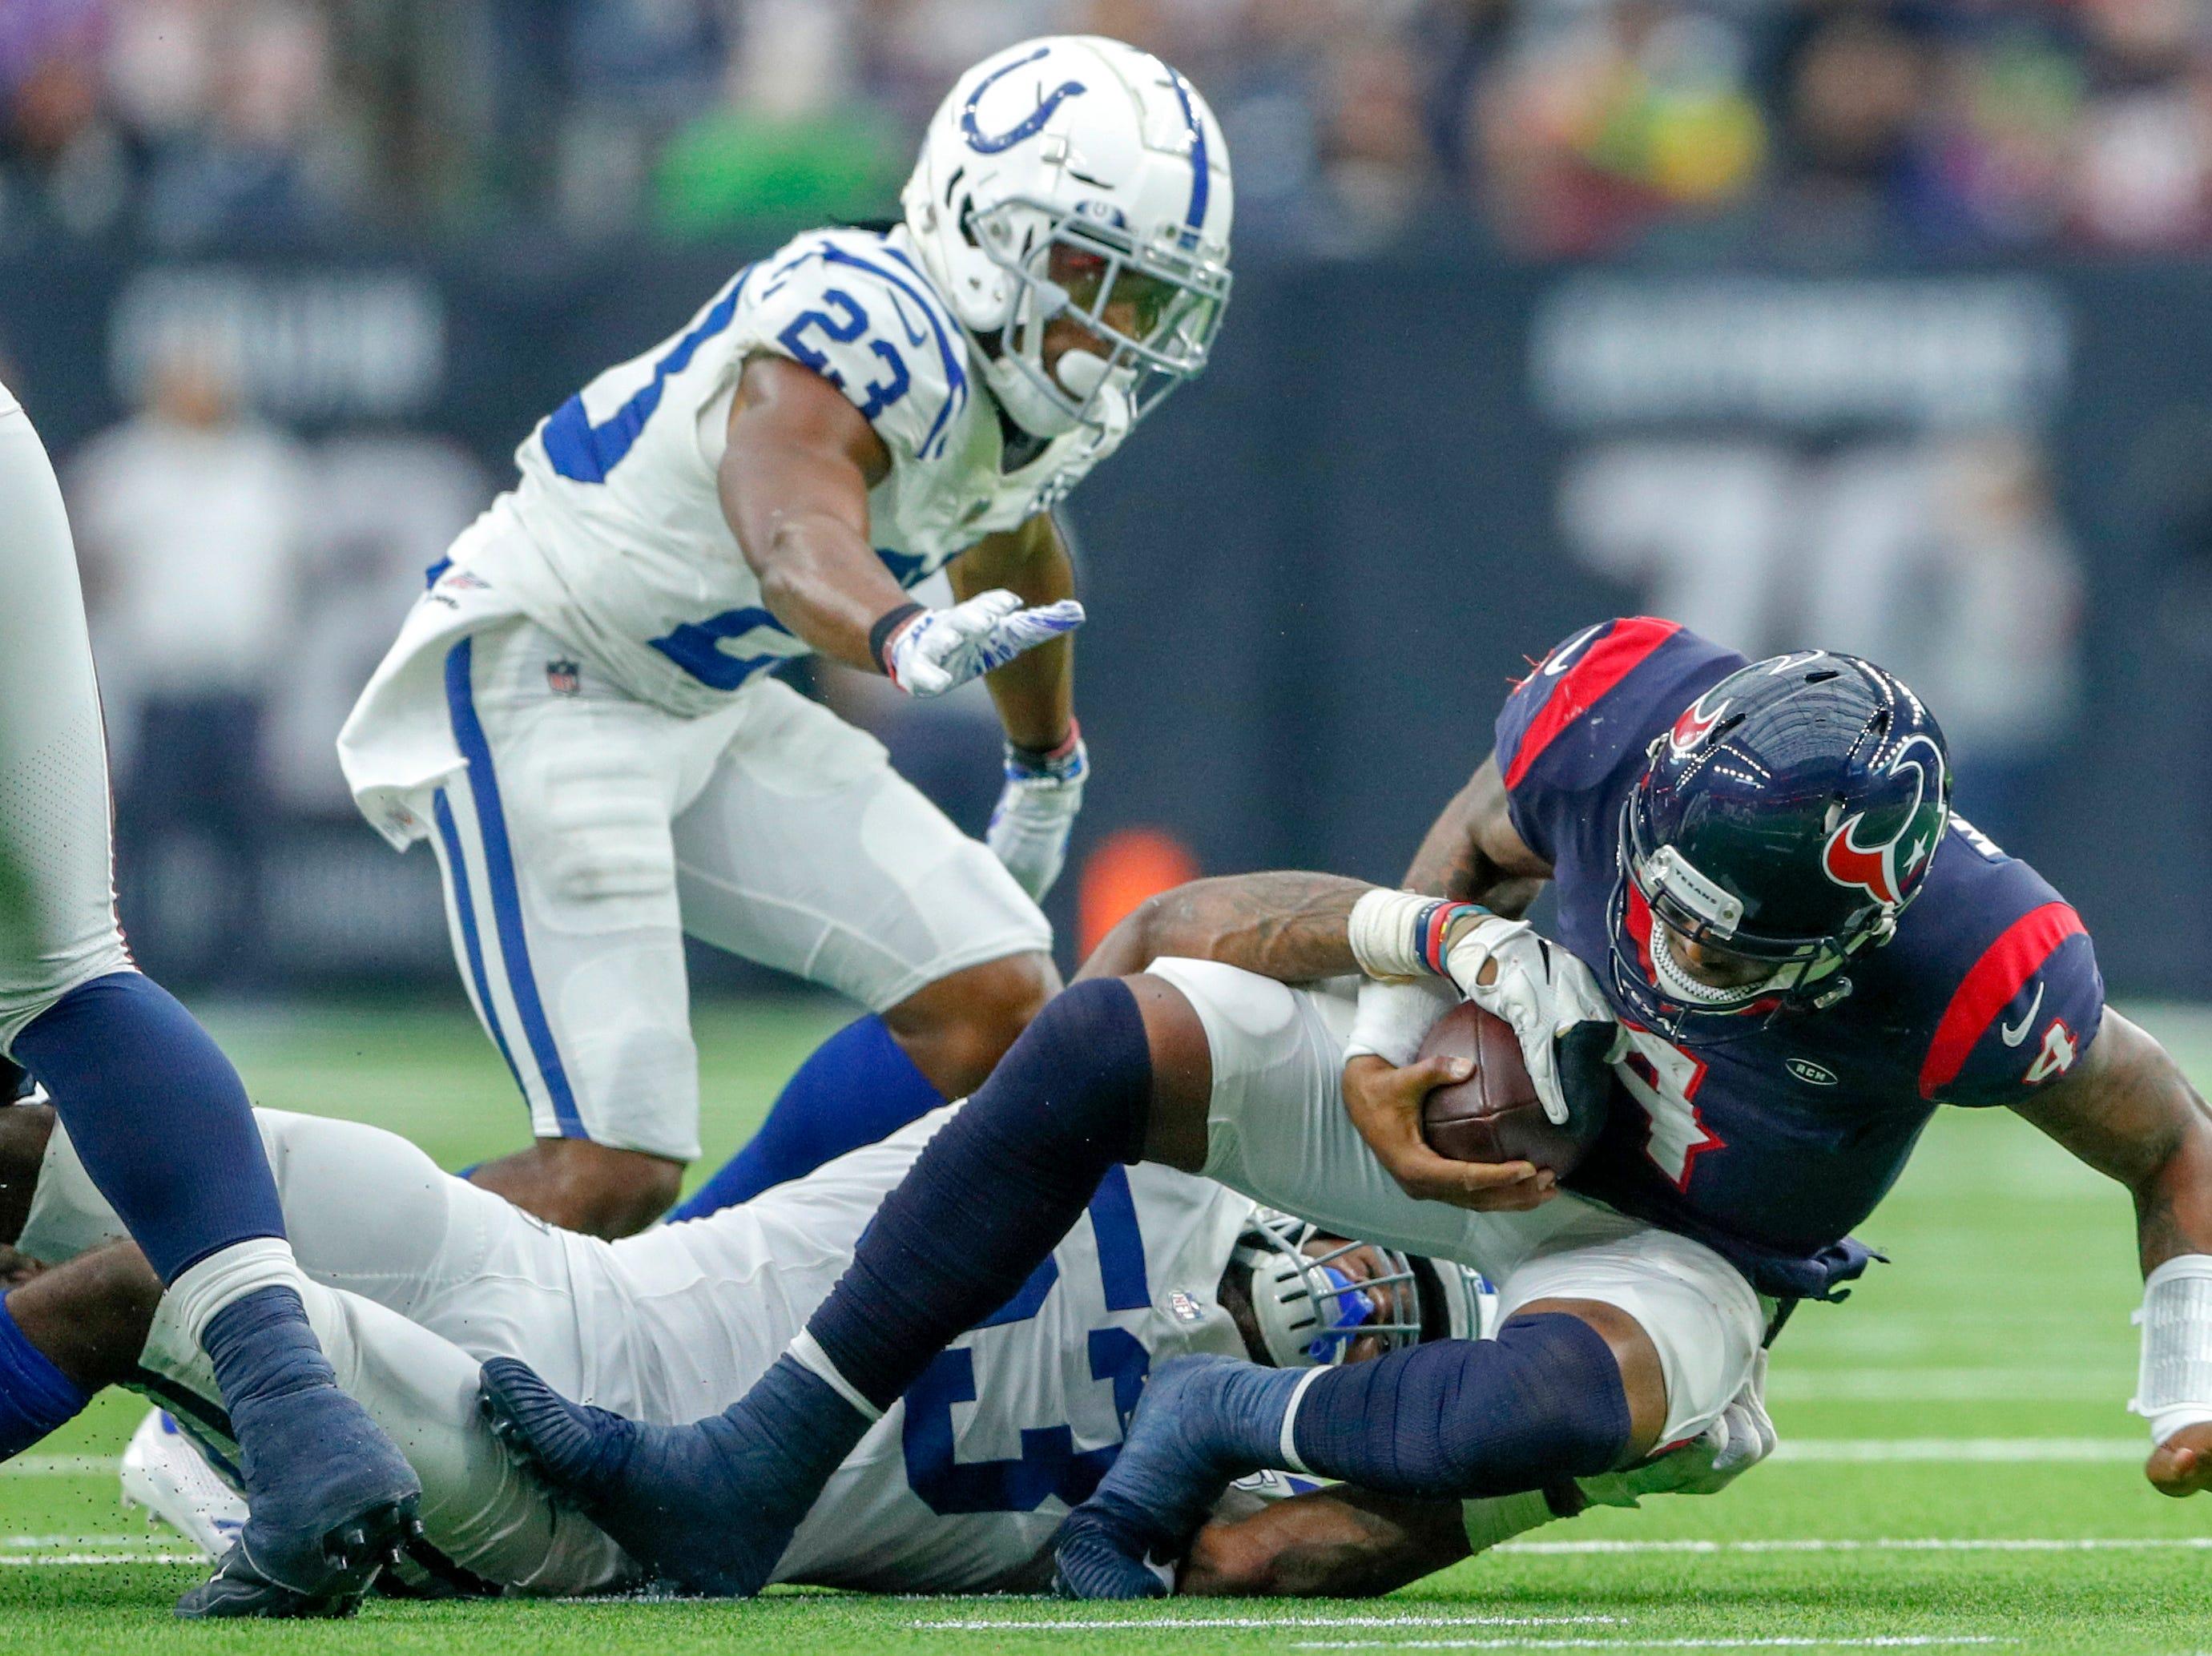 Indianapolis Colts outside linebacker Darius Leonard (53) brings down Houston Texans quarterback Deshaun Watson (4) in the third quarter at NRG Stadium in Houston on Sunday, Dec. 9, 2018.